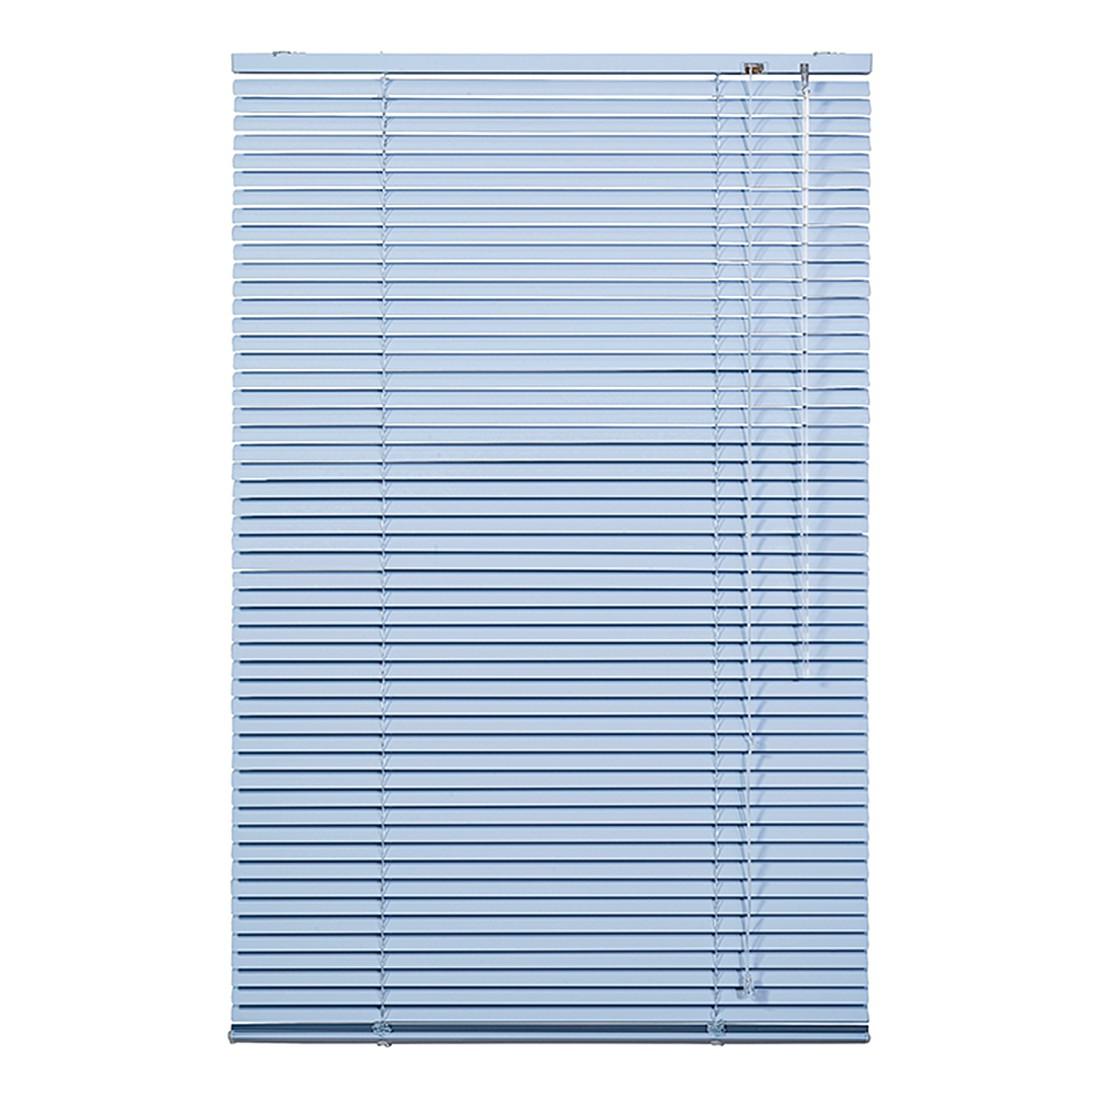 Jalousie Klemmfix – Aluminium, Blau – (H x B): 60 x 40 cm, Wohn-Guide kaufen